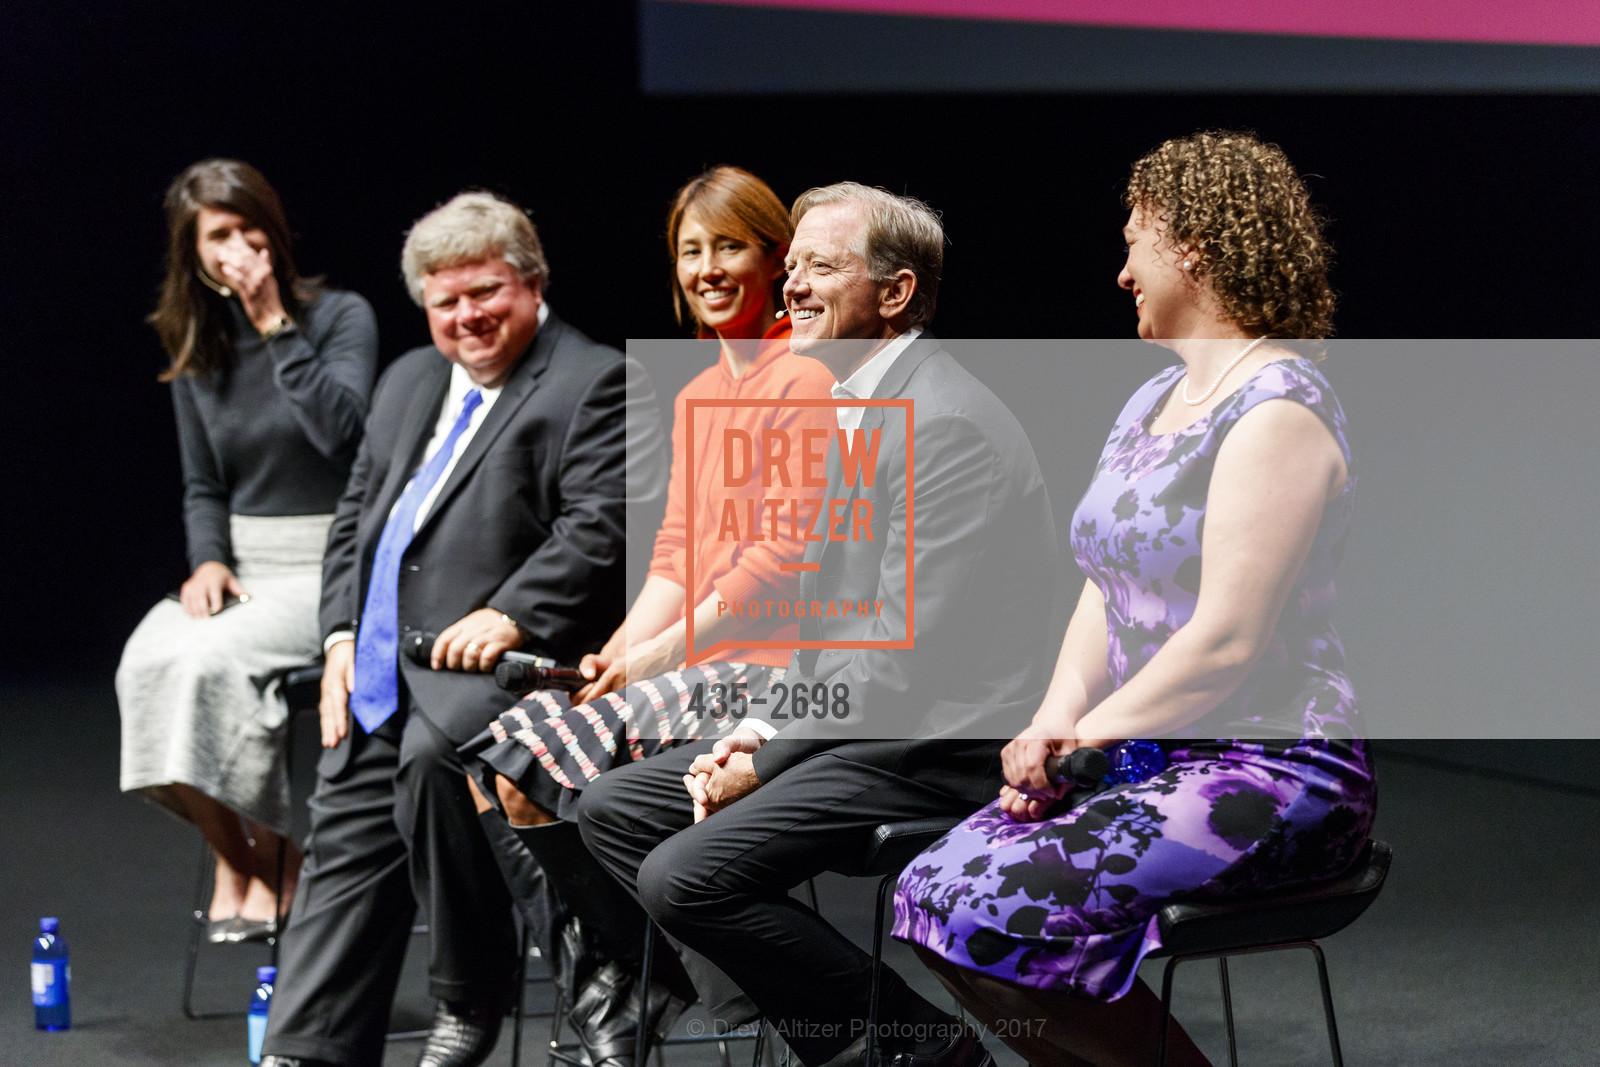 Emily Kirsch, Dale Ross, Gia Schneider, Jamie Redford, Jessica Scott, Photo #435-2698